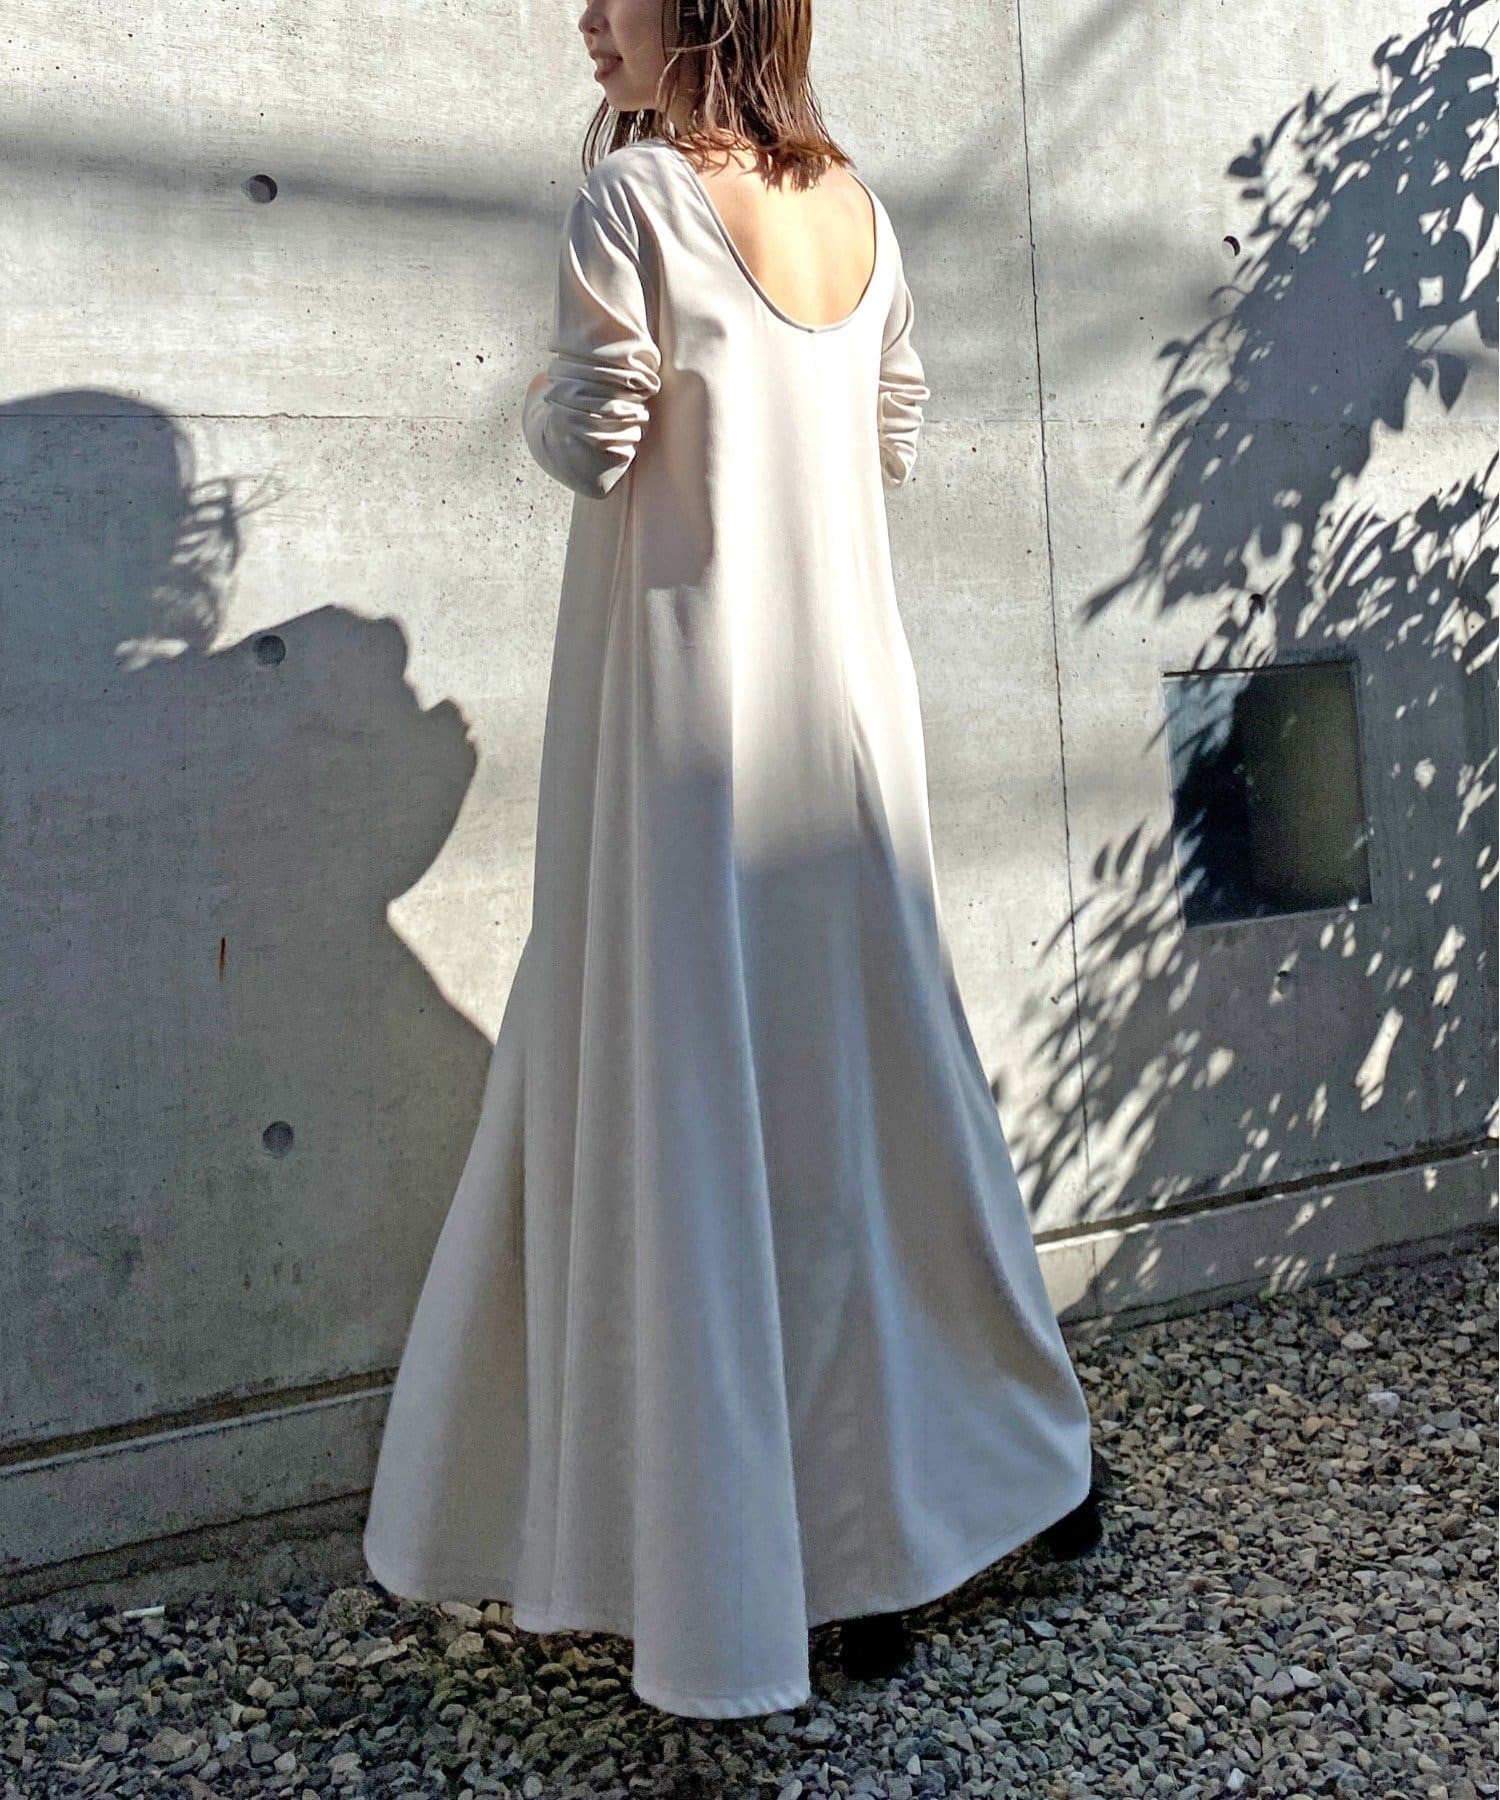 Omekashi(オメカシ) Önf(オンフ) カットジョーゼットドレス